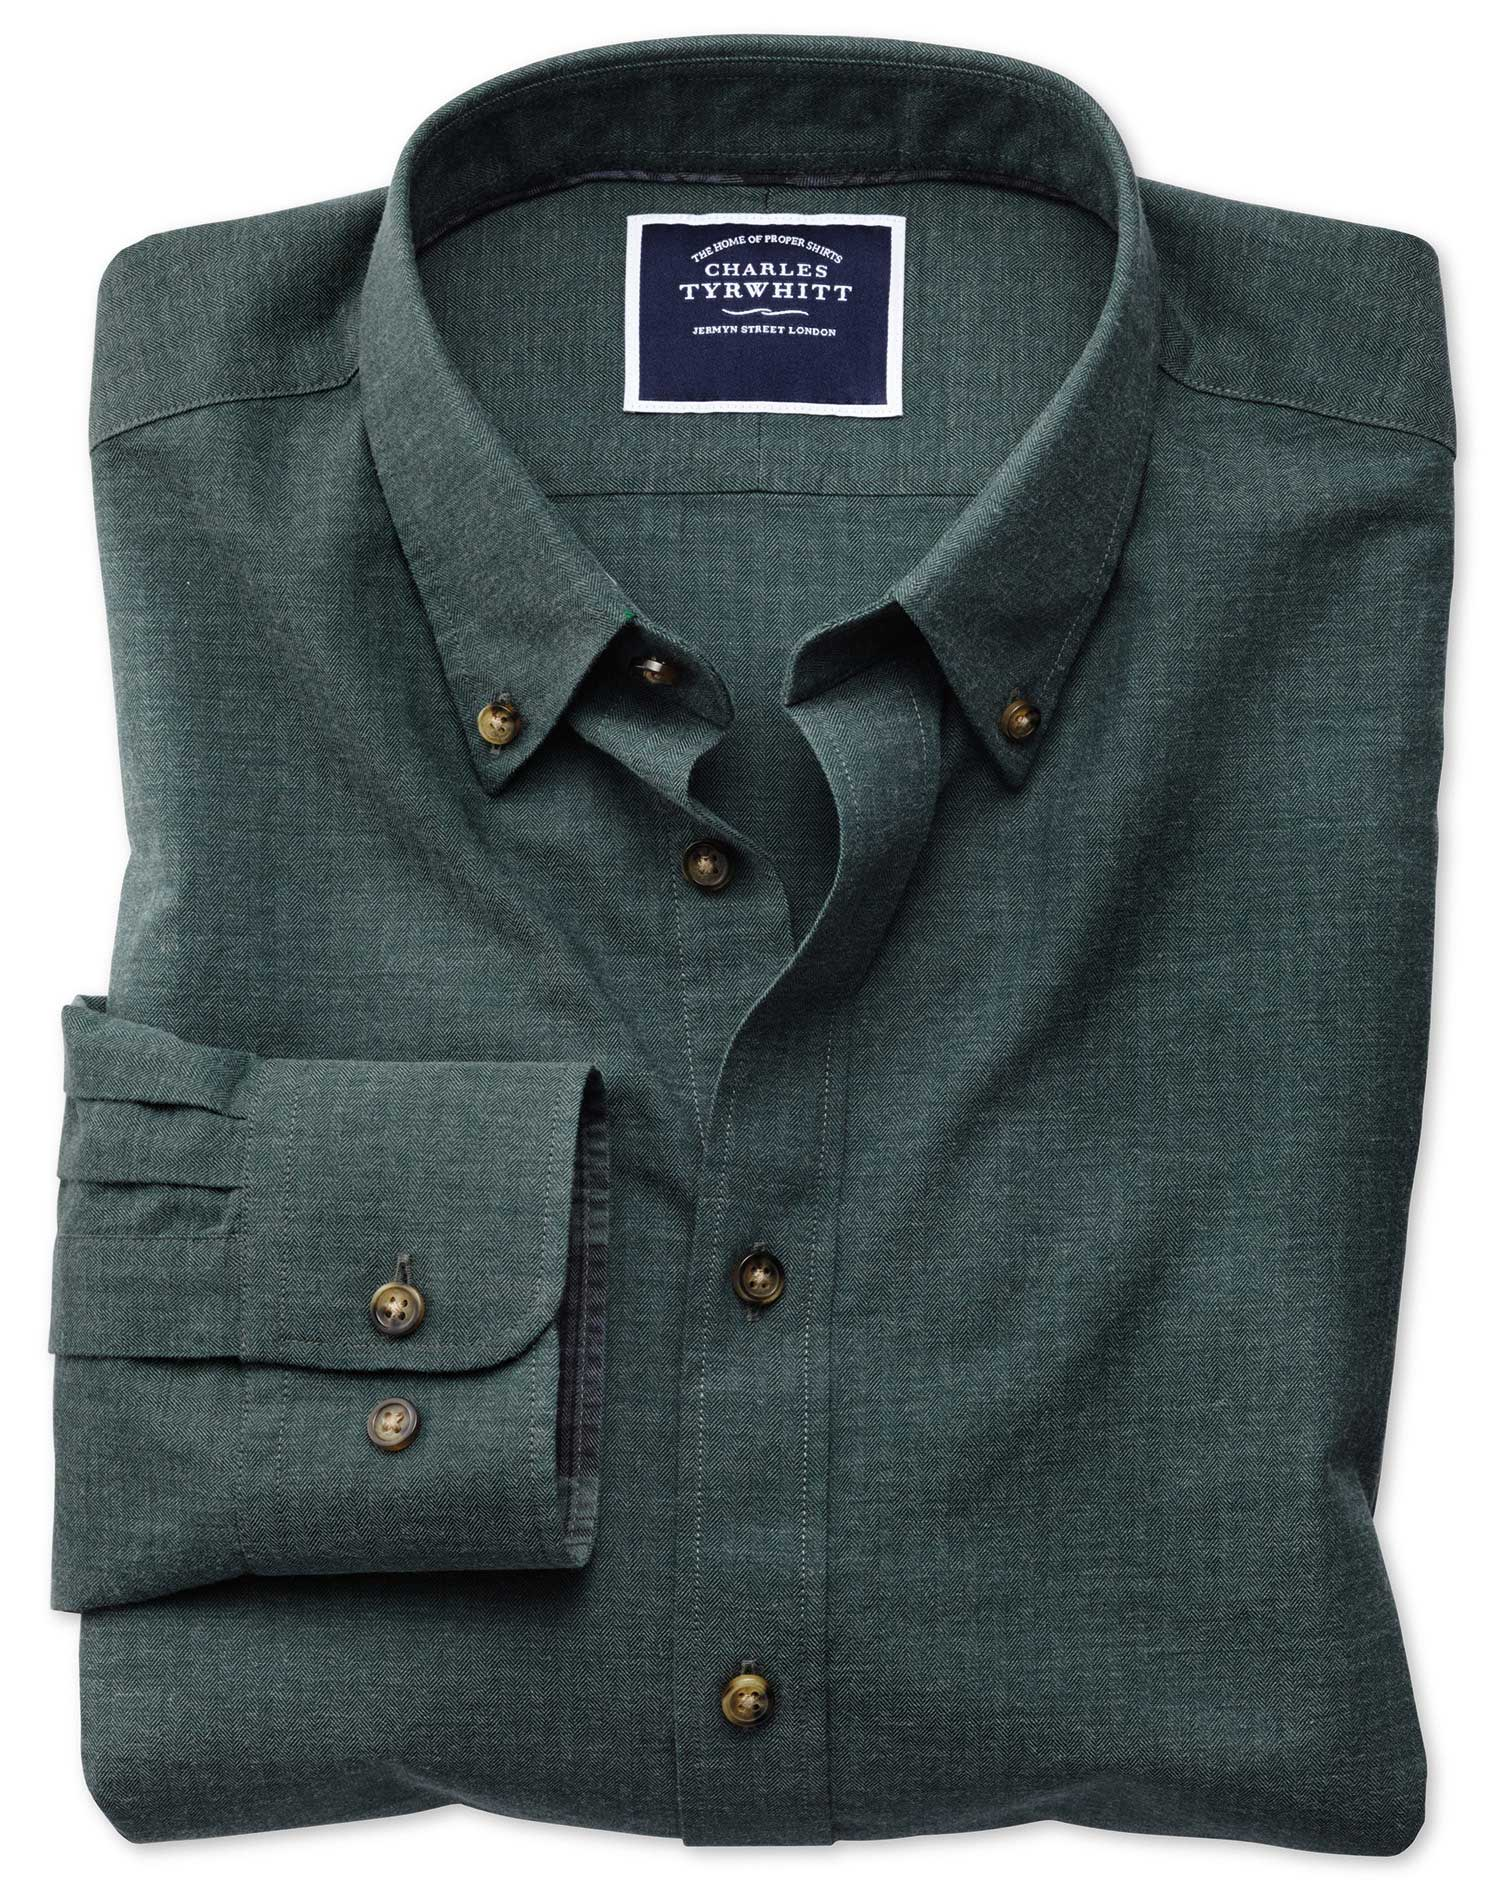 Classic Fit Green Herringbone Melange Cotton Shirt Single Cuff Size Medium by Charles Tyrwhitt